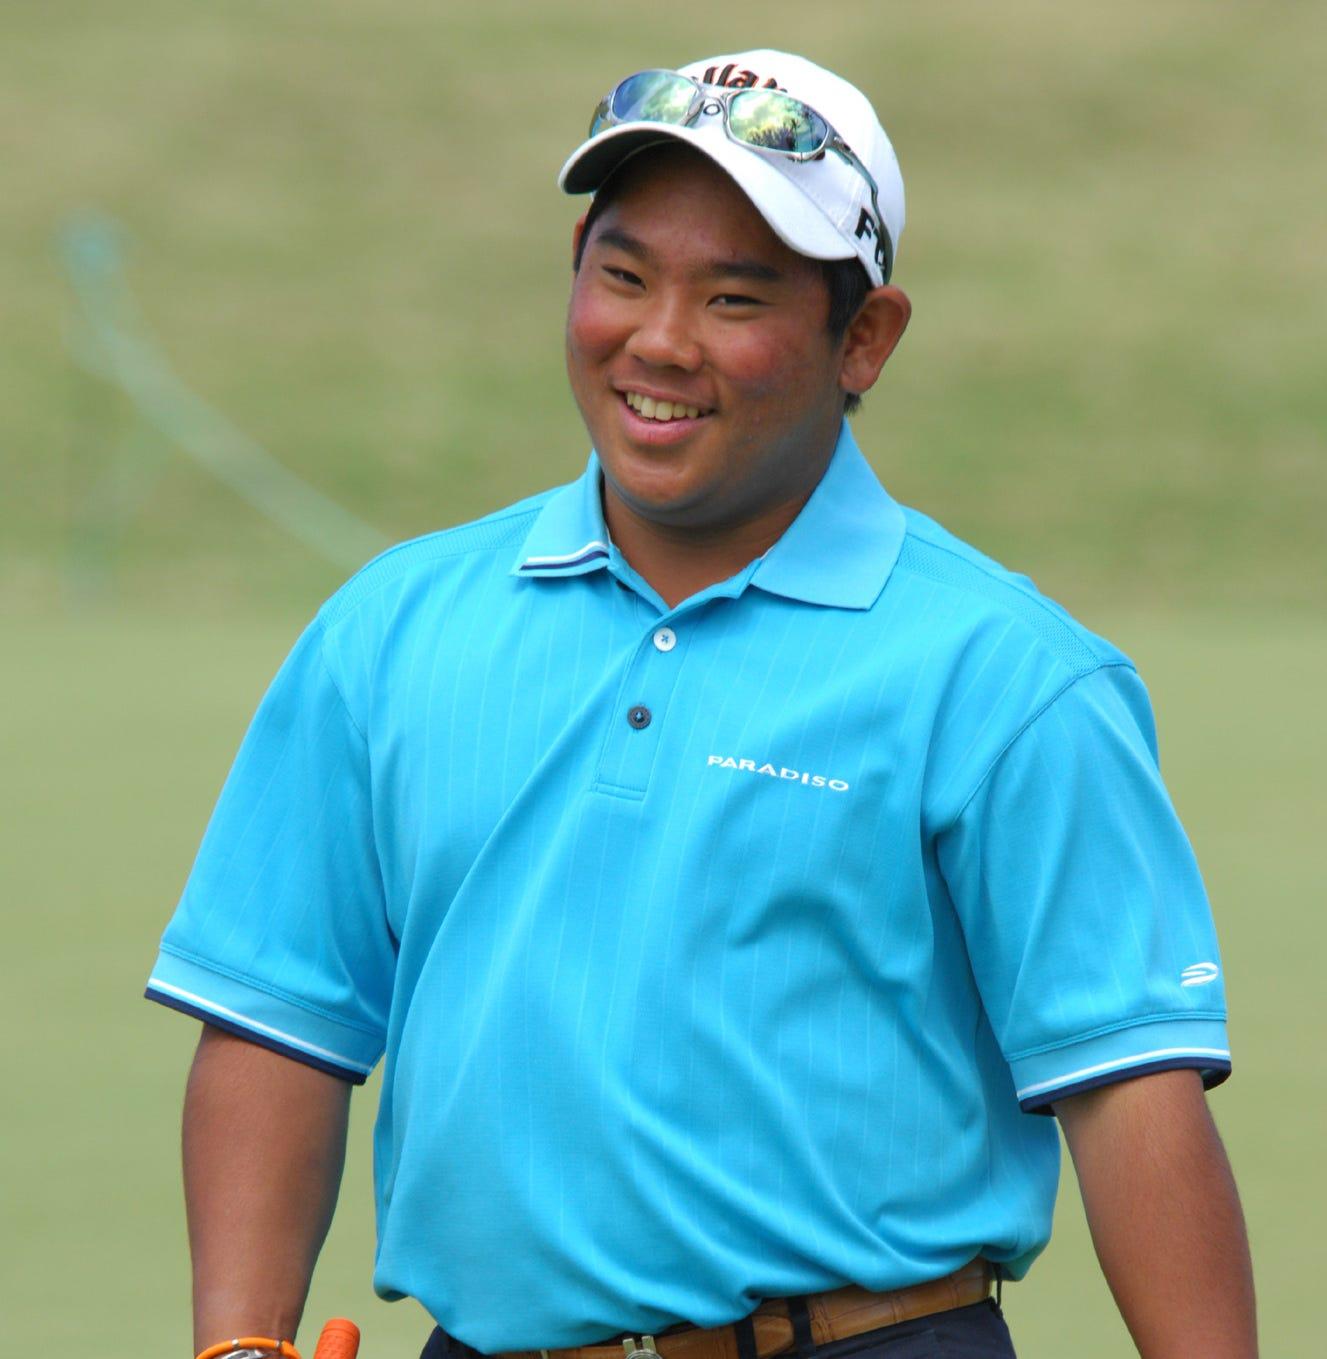 Professional golfer Tadd Fujikawa comes out as gay